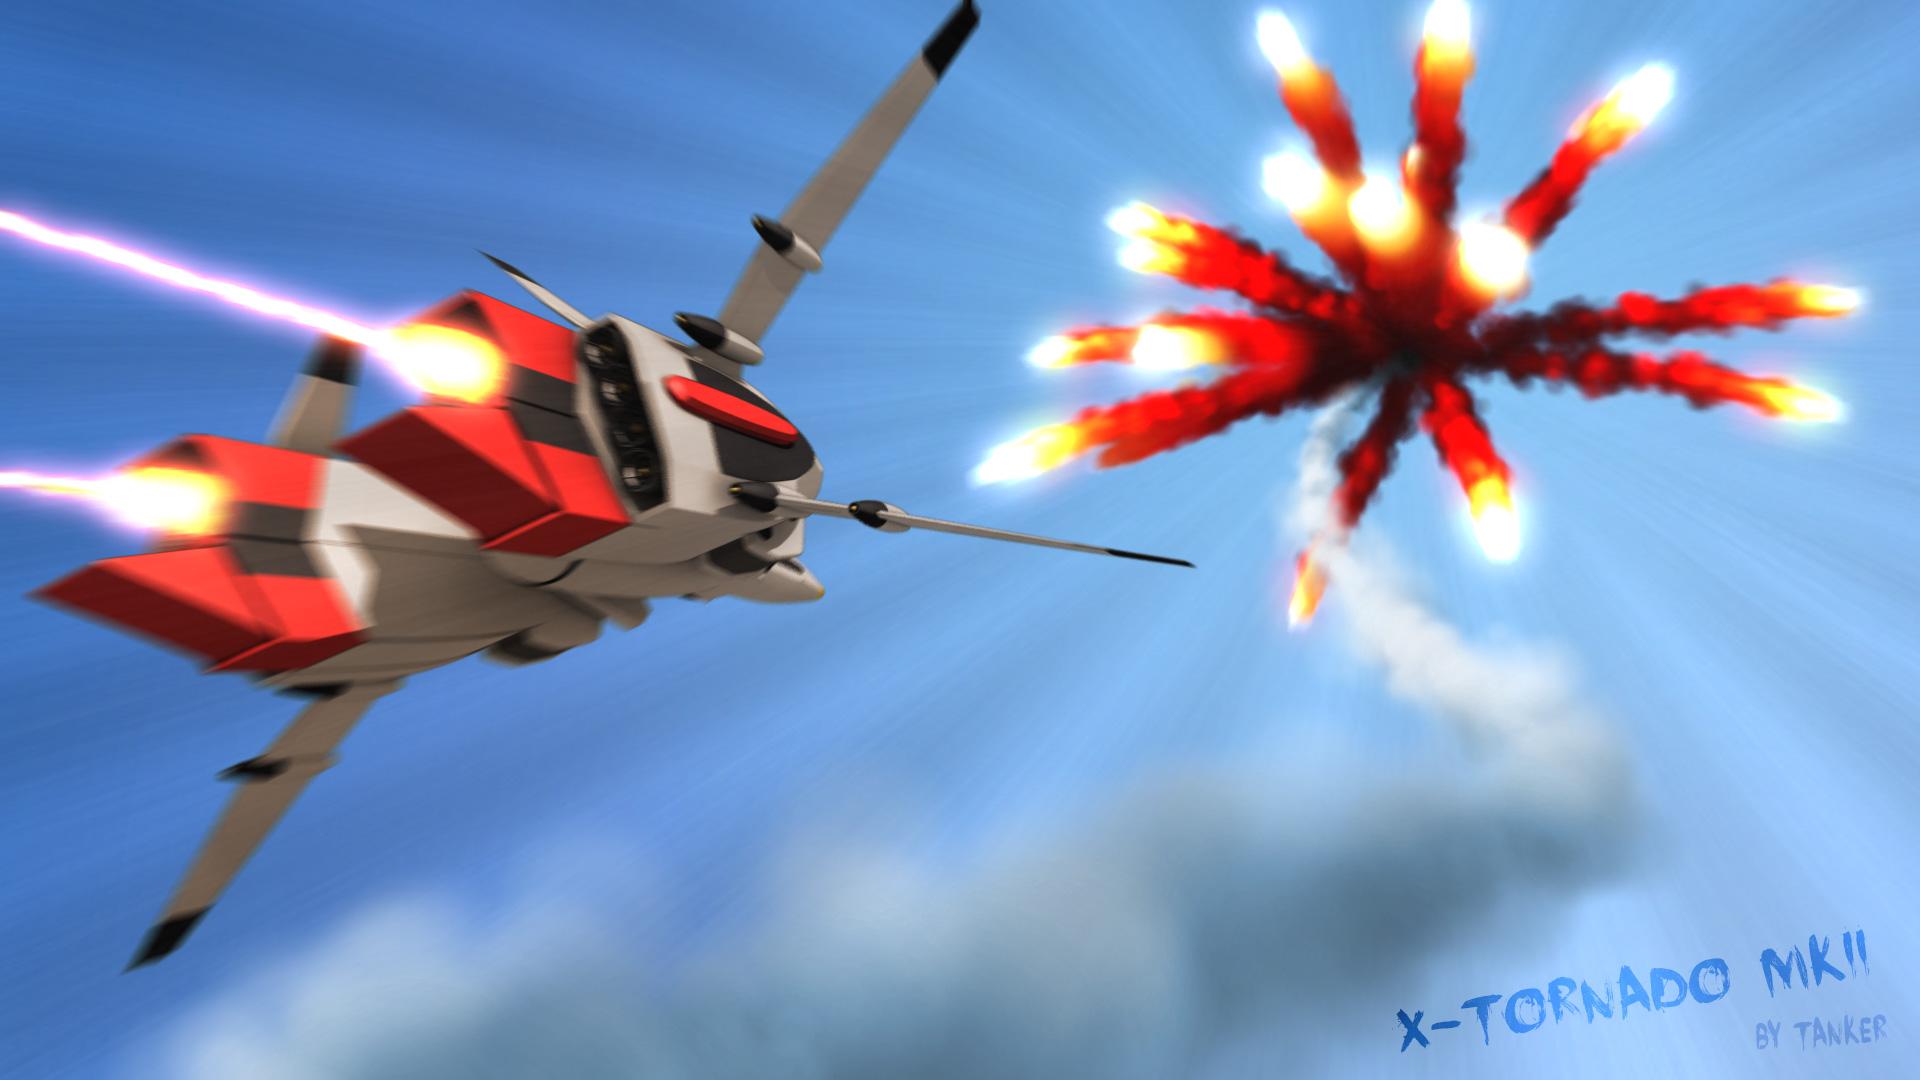 Galerie 3d de Tanker - Page 7 X-Tornado-MKII-artworks